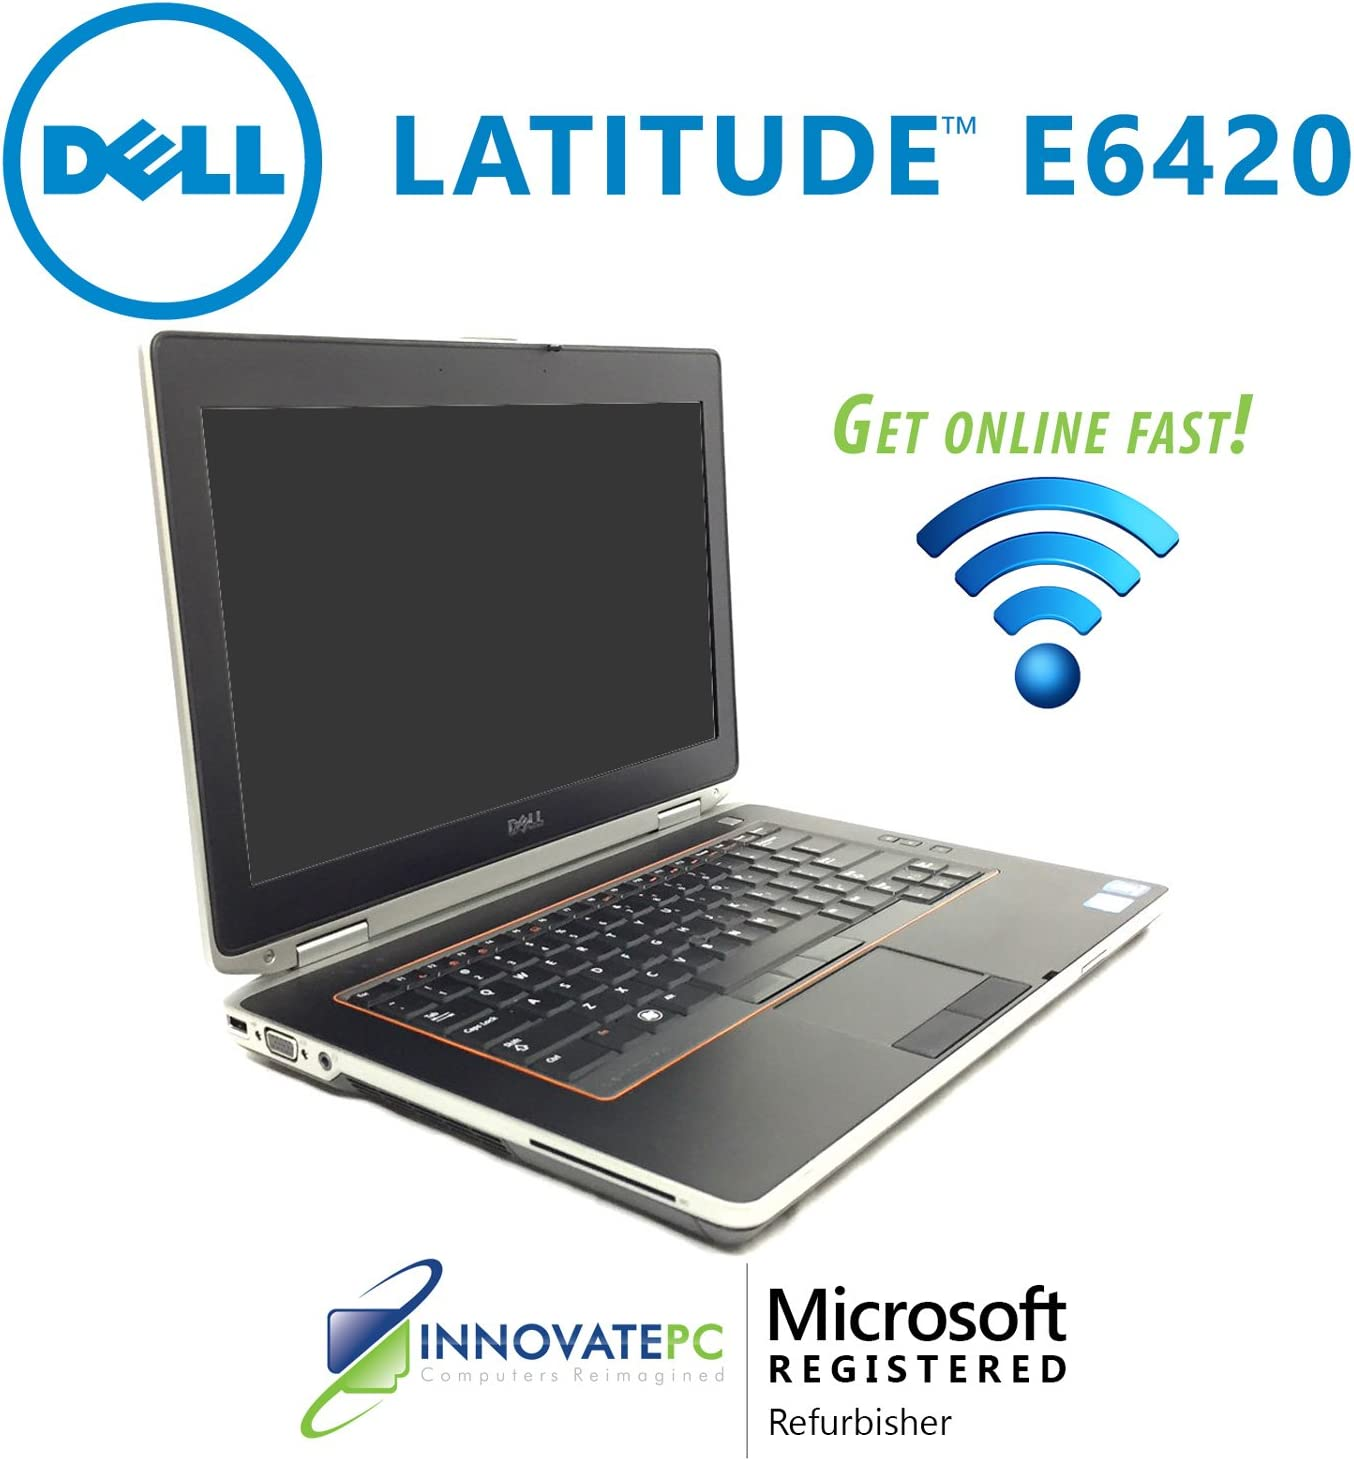 "Dell Latitude E6420 Core i5-2520M 2.5GHz 4GB 250GB DVD±RW NVIDIA Optimus 14"" LED Laptop Windows 7 Professional w/6-Cell Battery"